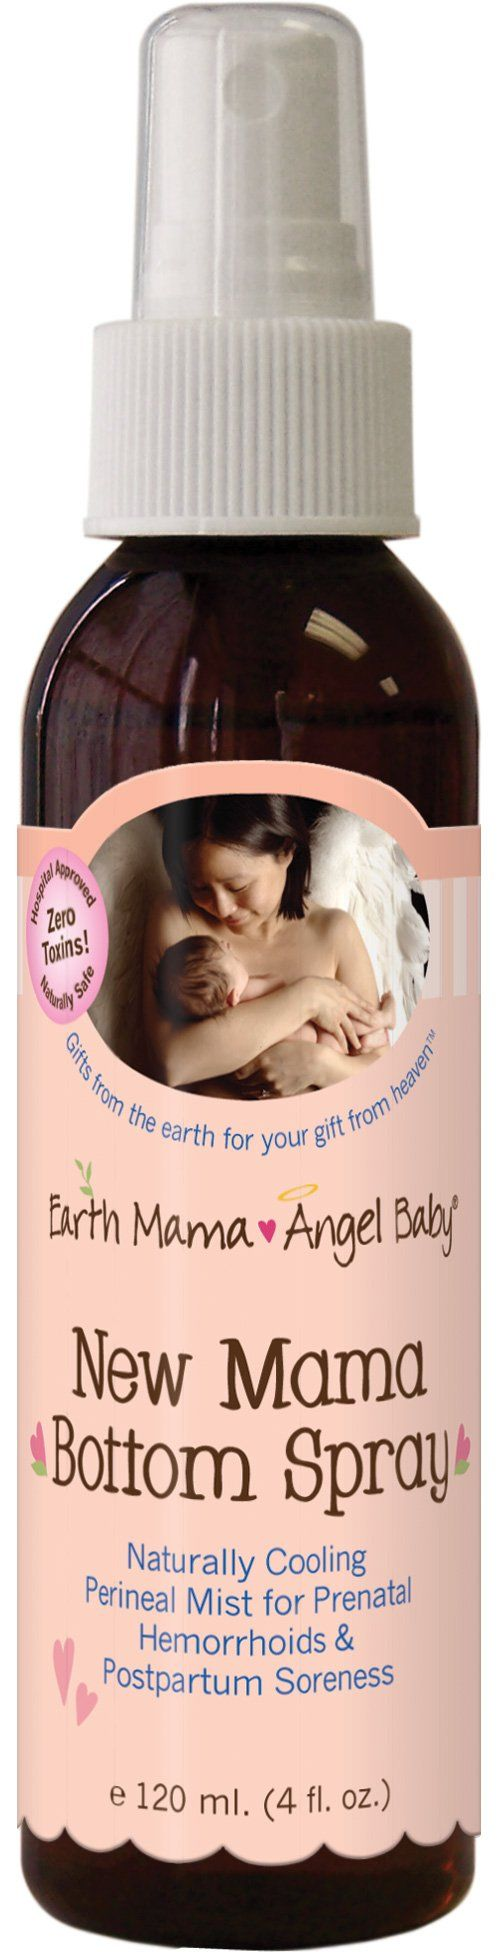 Earth Mama Angel Baby - New Mama Bottom Spray, 4 fl oz liquid